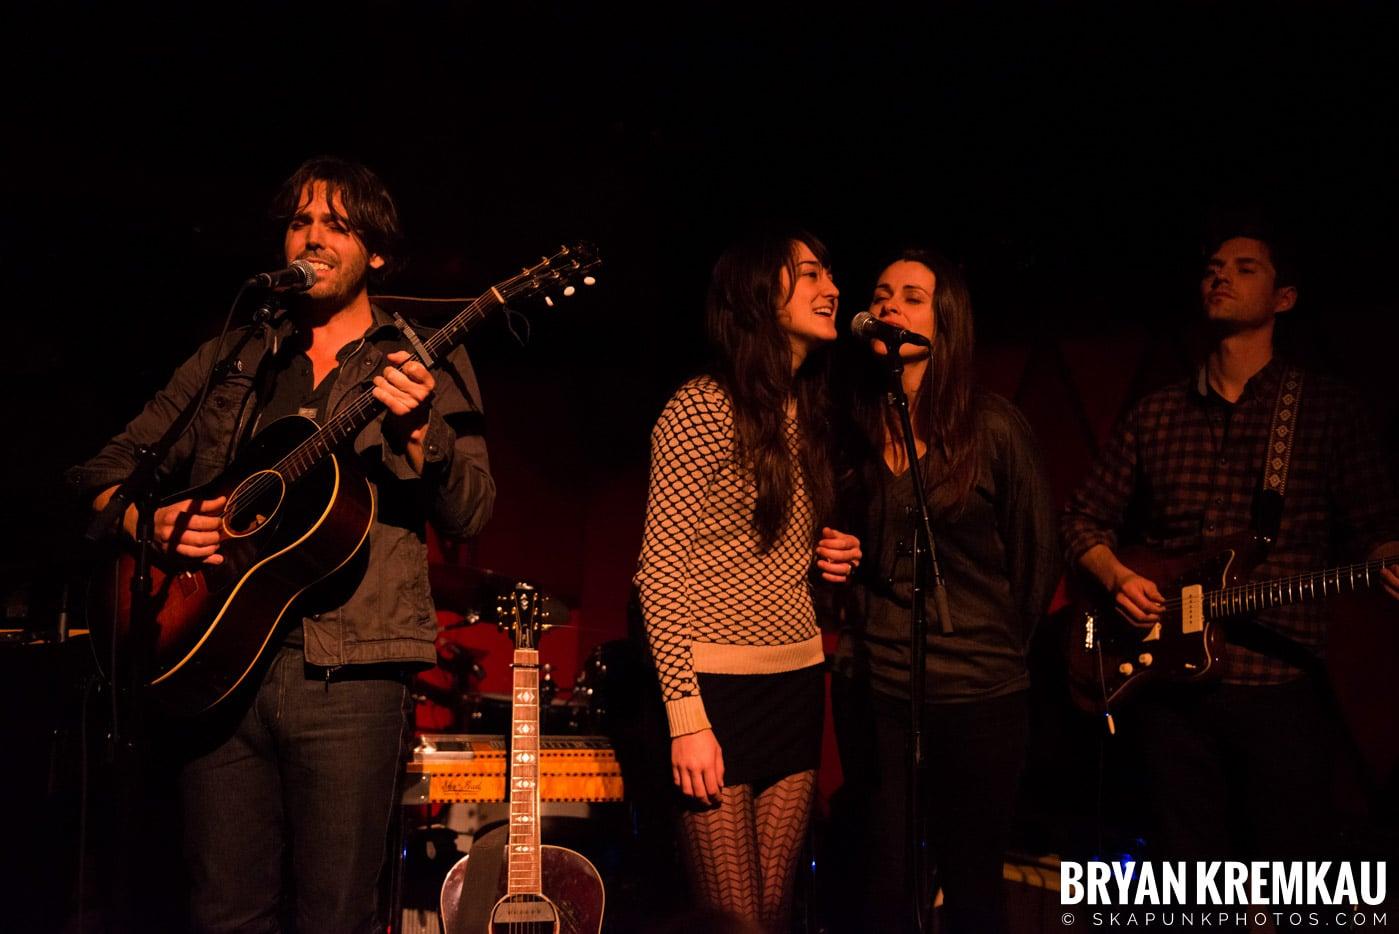 Peter Bradley Adams @ Rockwood Music Hall, NYC - 3.9.13 (1)